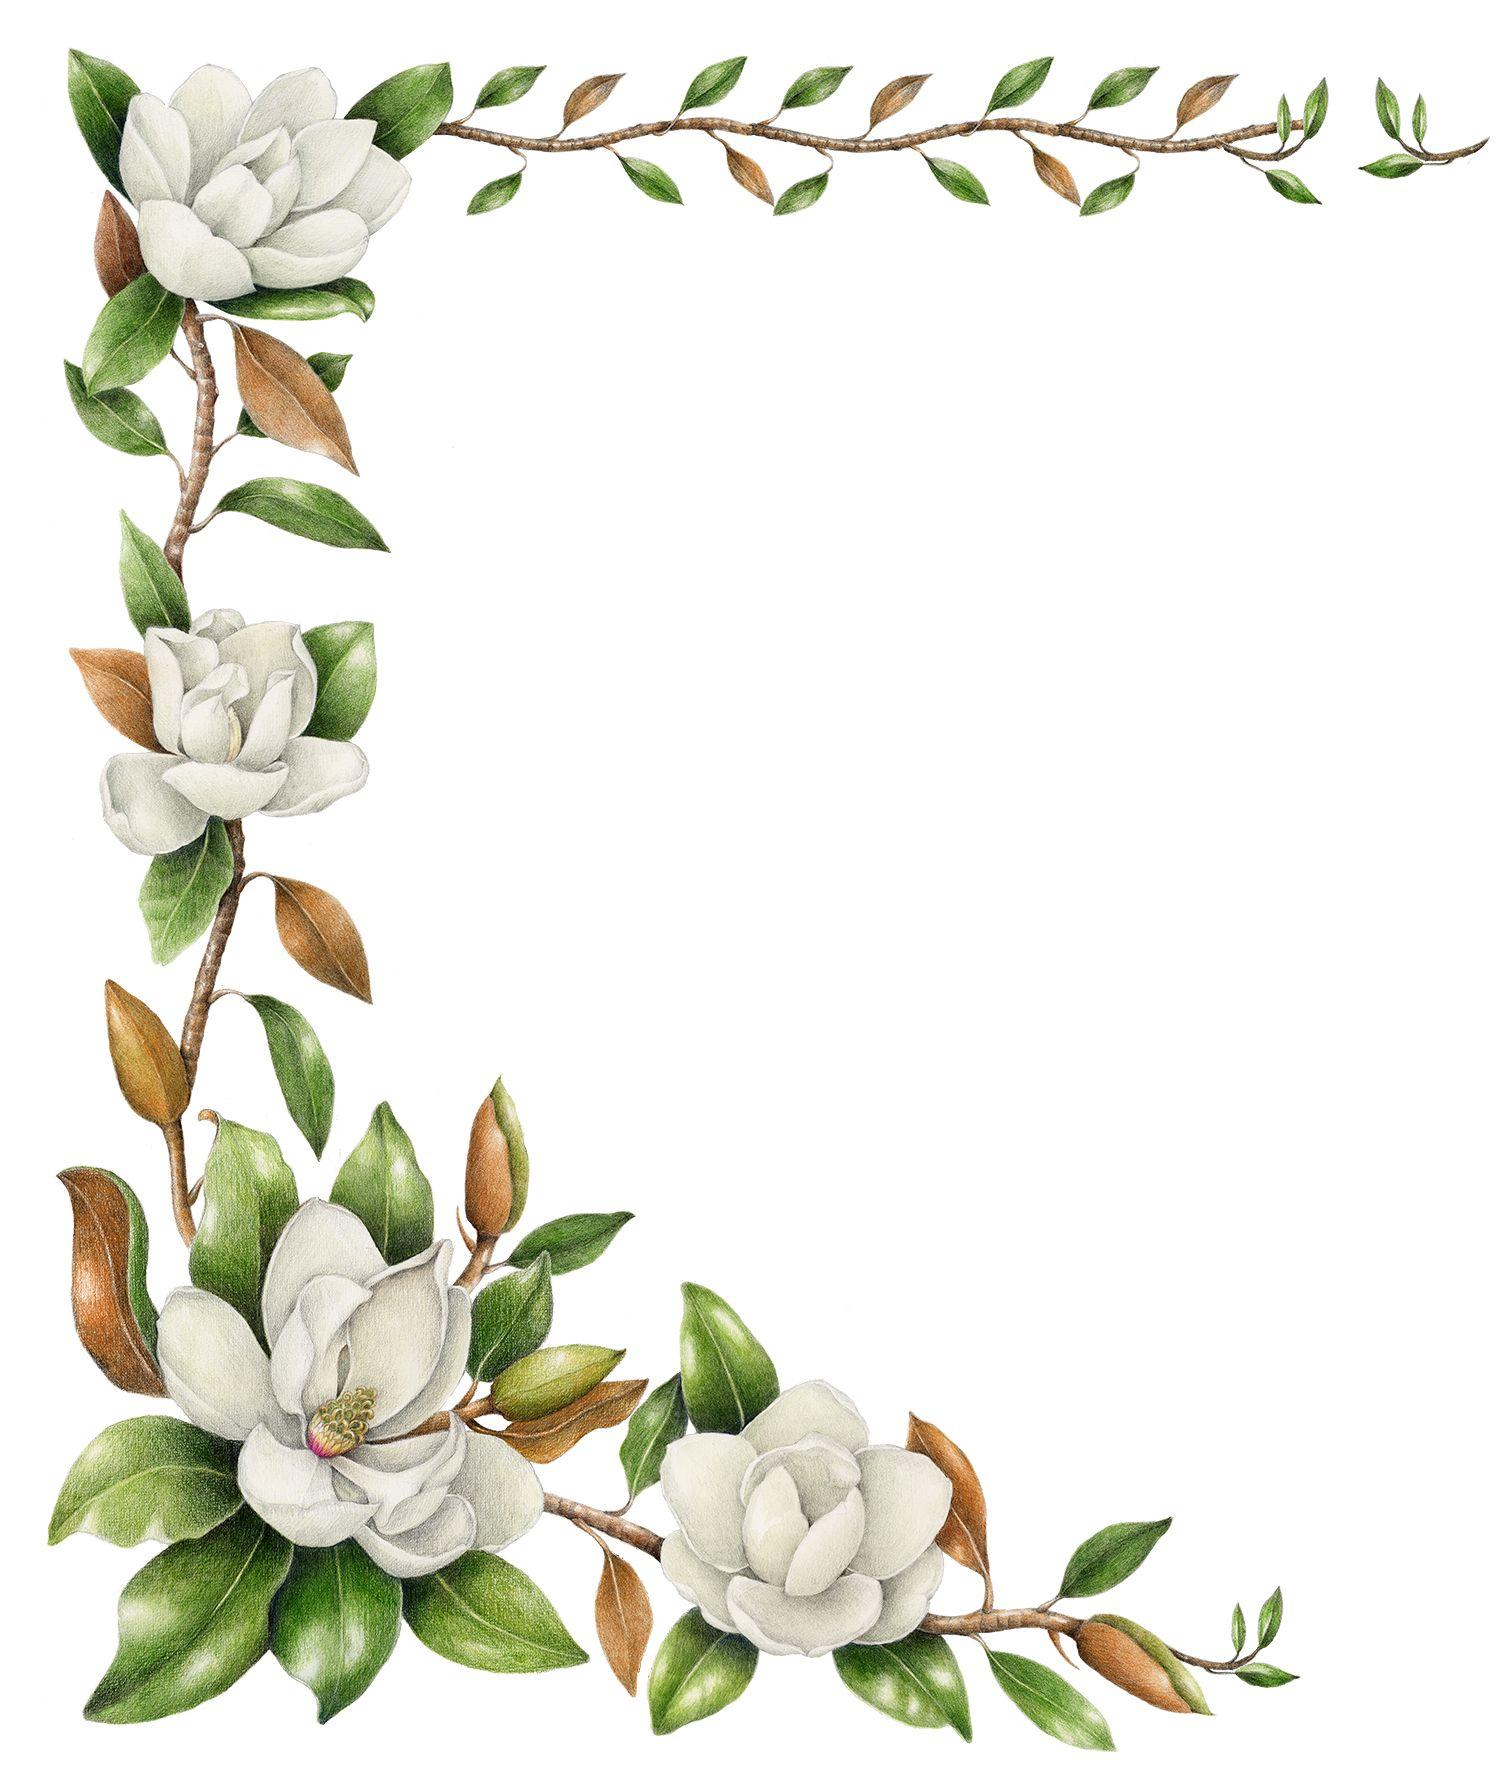 Southern Magnolia Magnolia Grandiflora With Images Botanical Illustration Flower Drawing Botanical Flowers